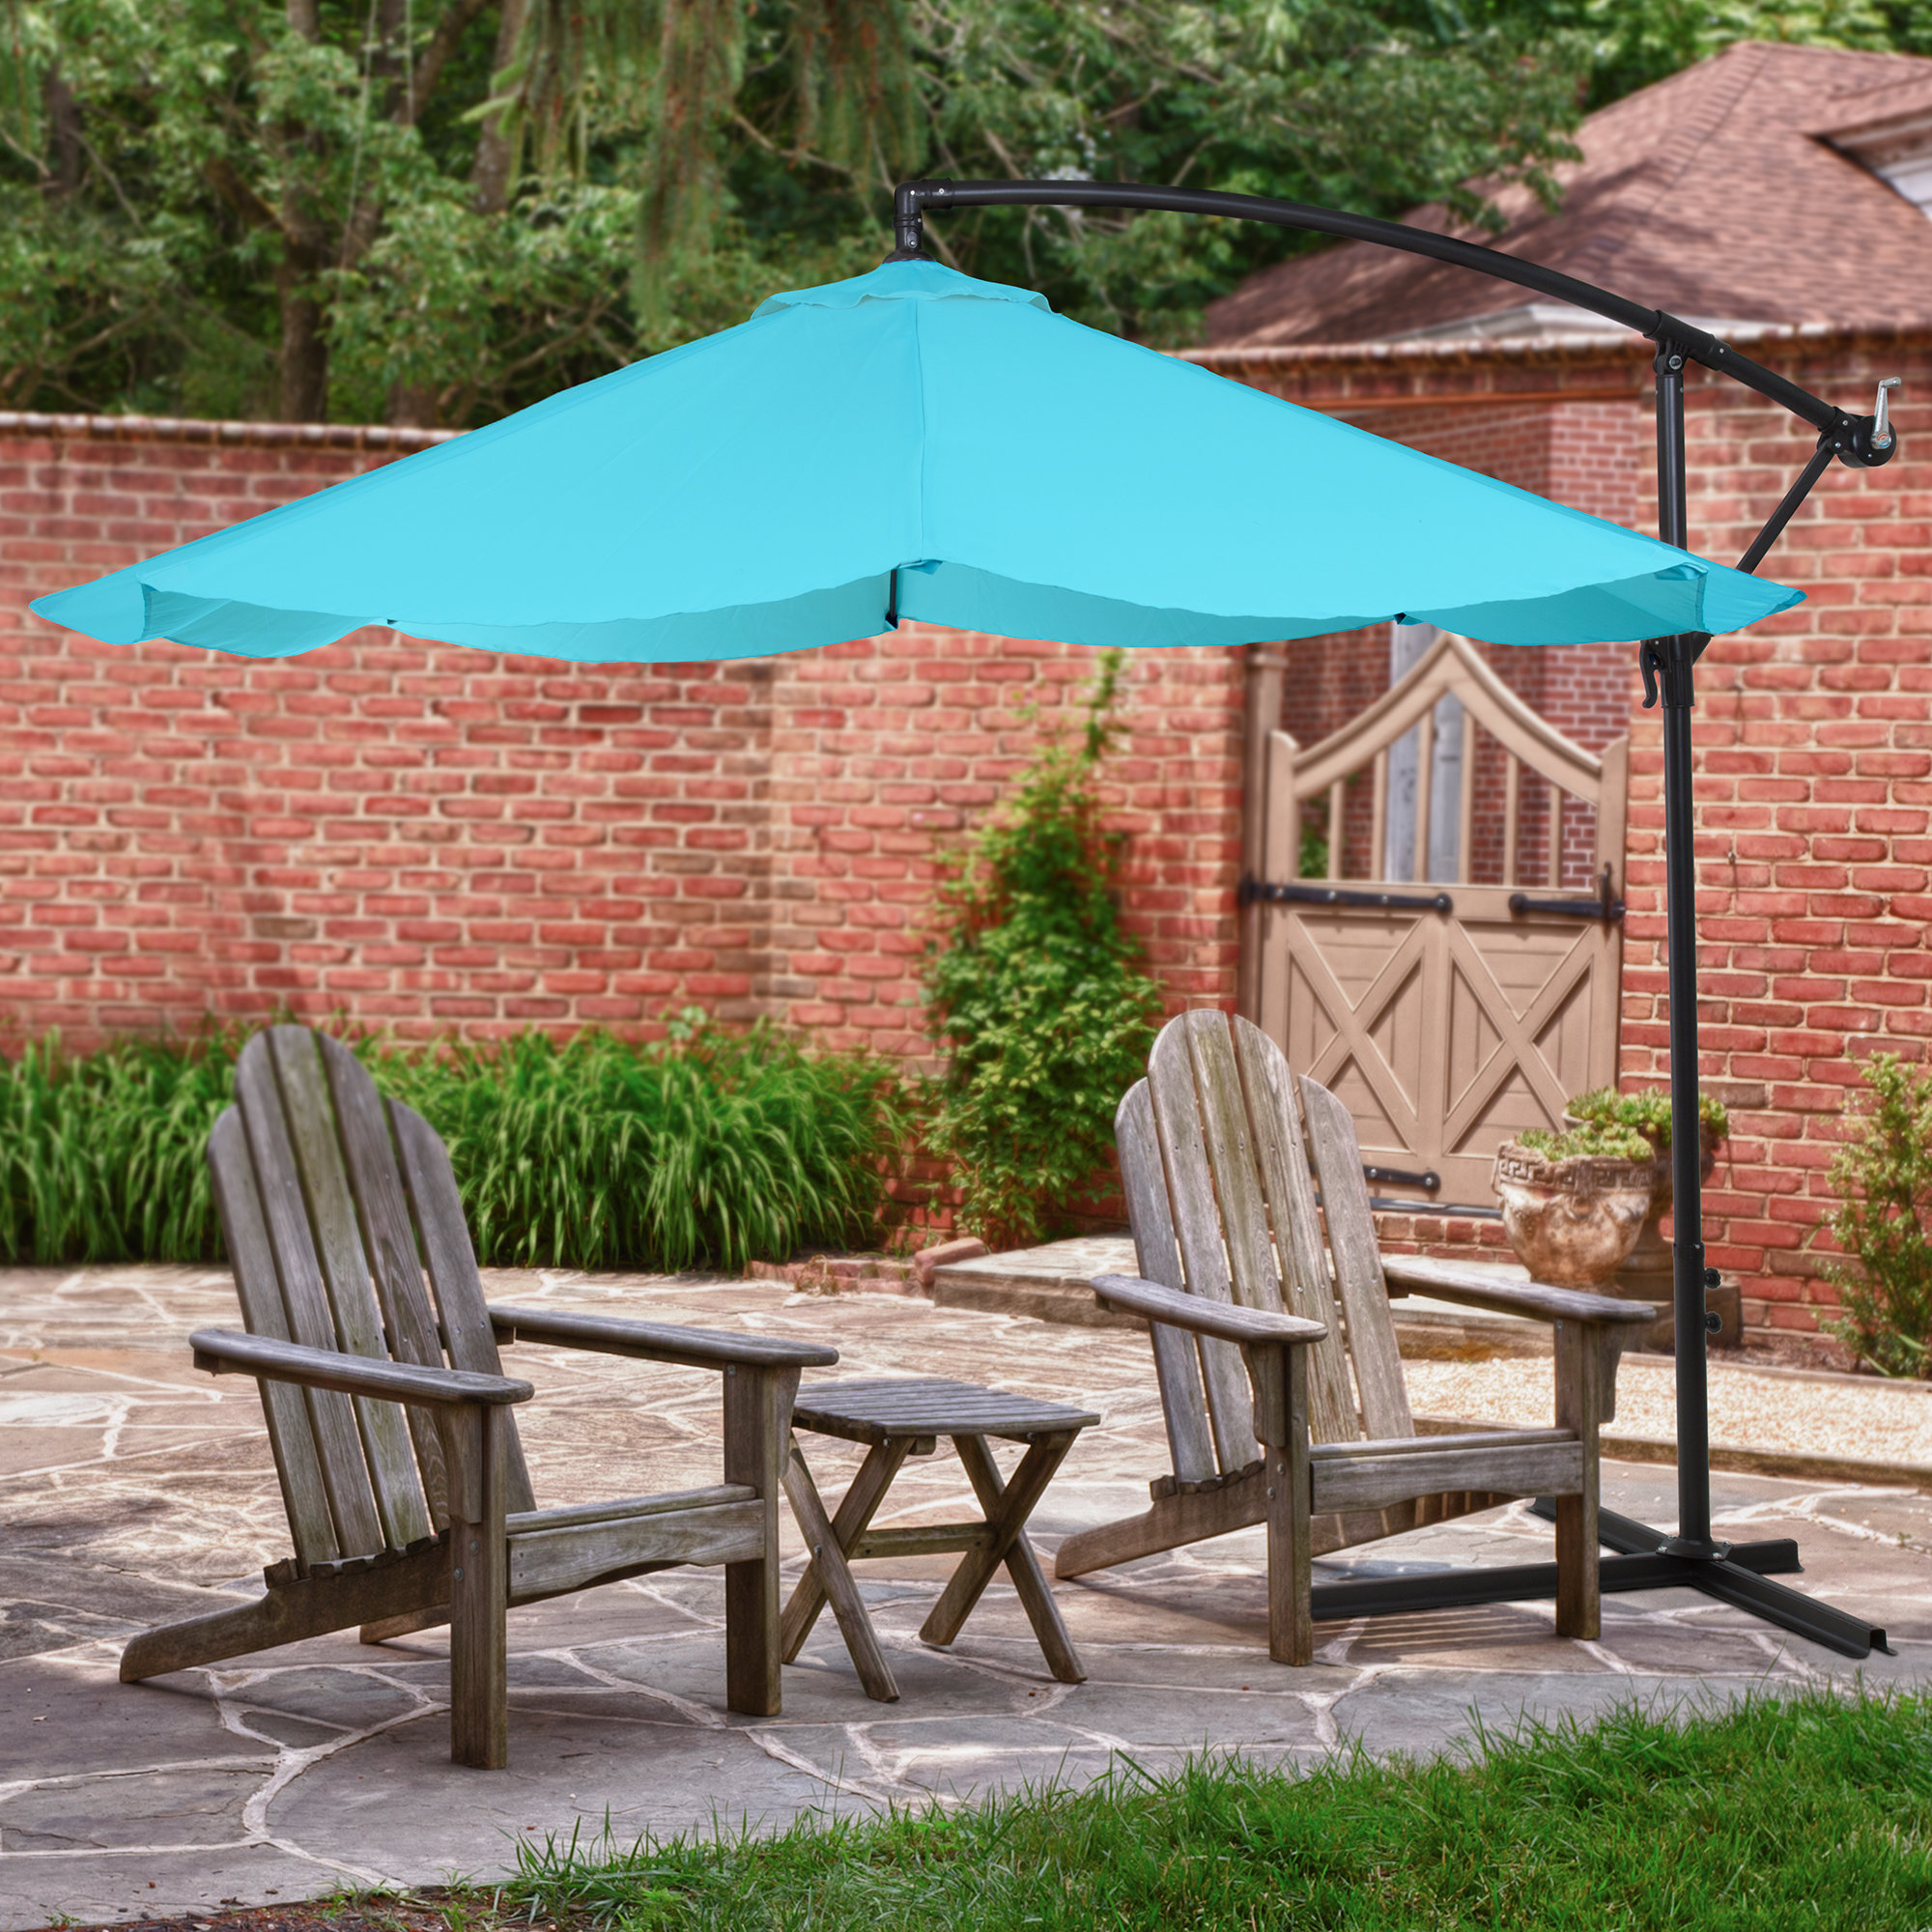 Vassalboro 10' Cantilever Umbrella For Fashionable Jaelynn Cantilever Umbrellas (View 16 of 20)